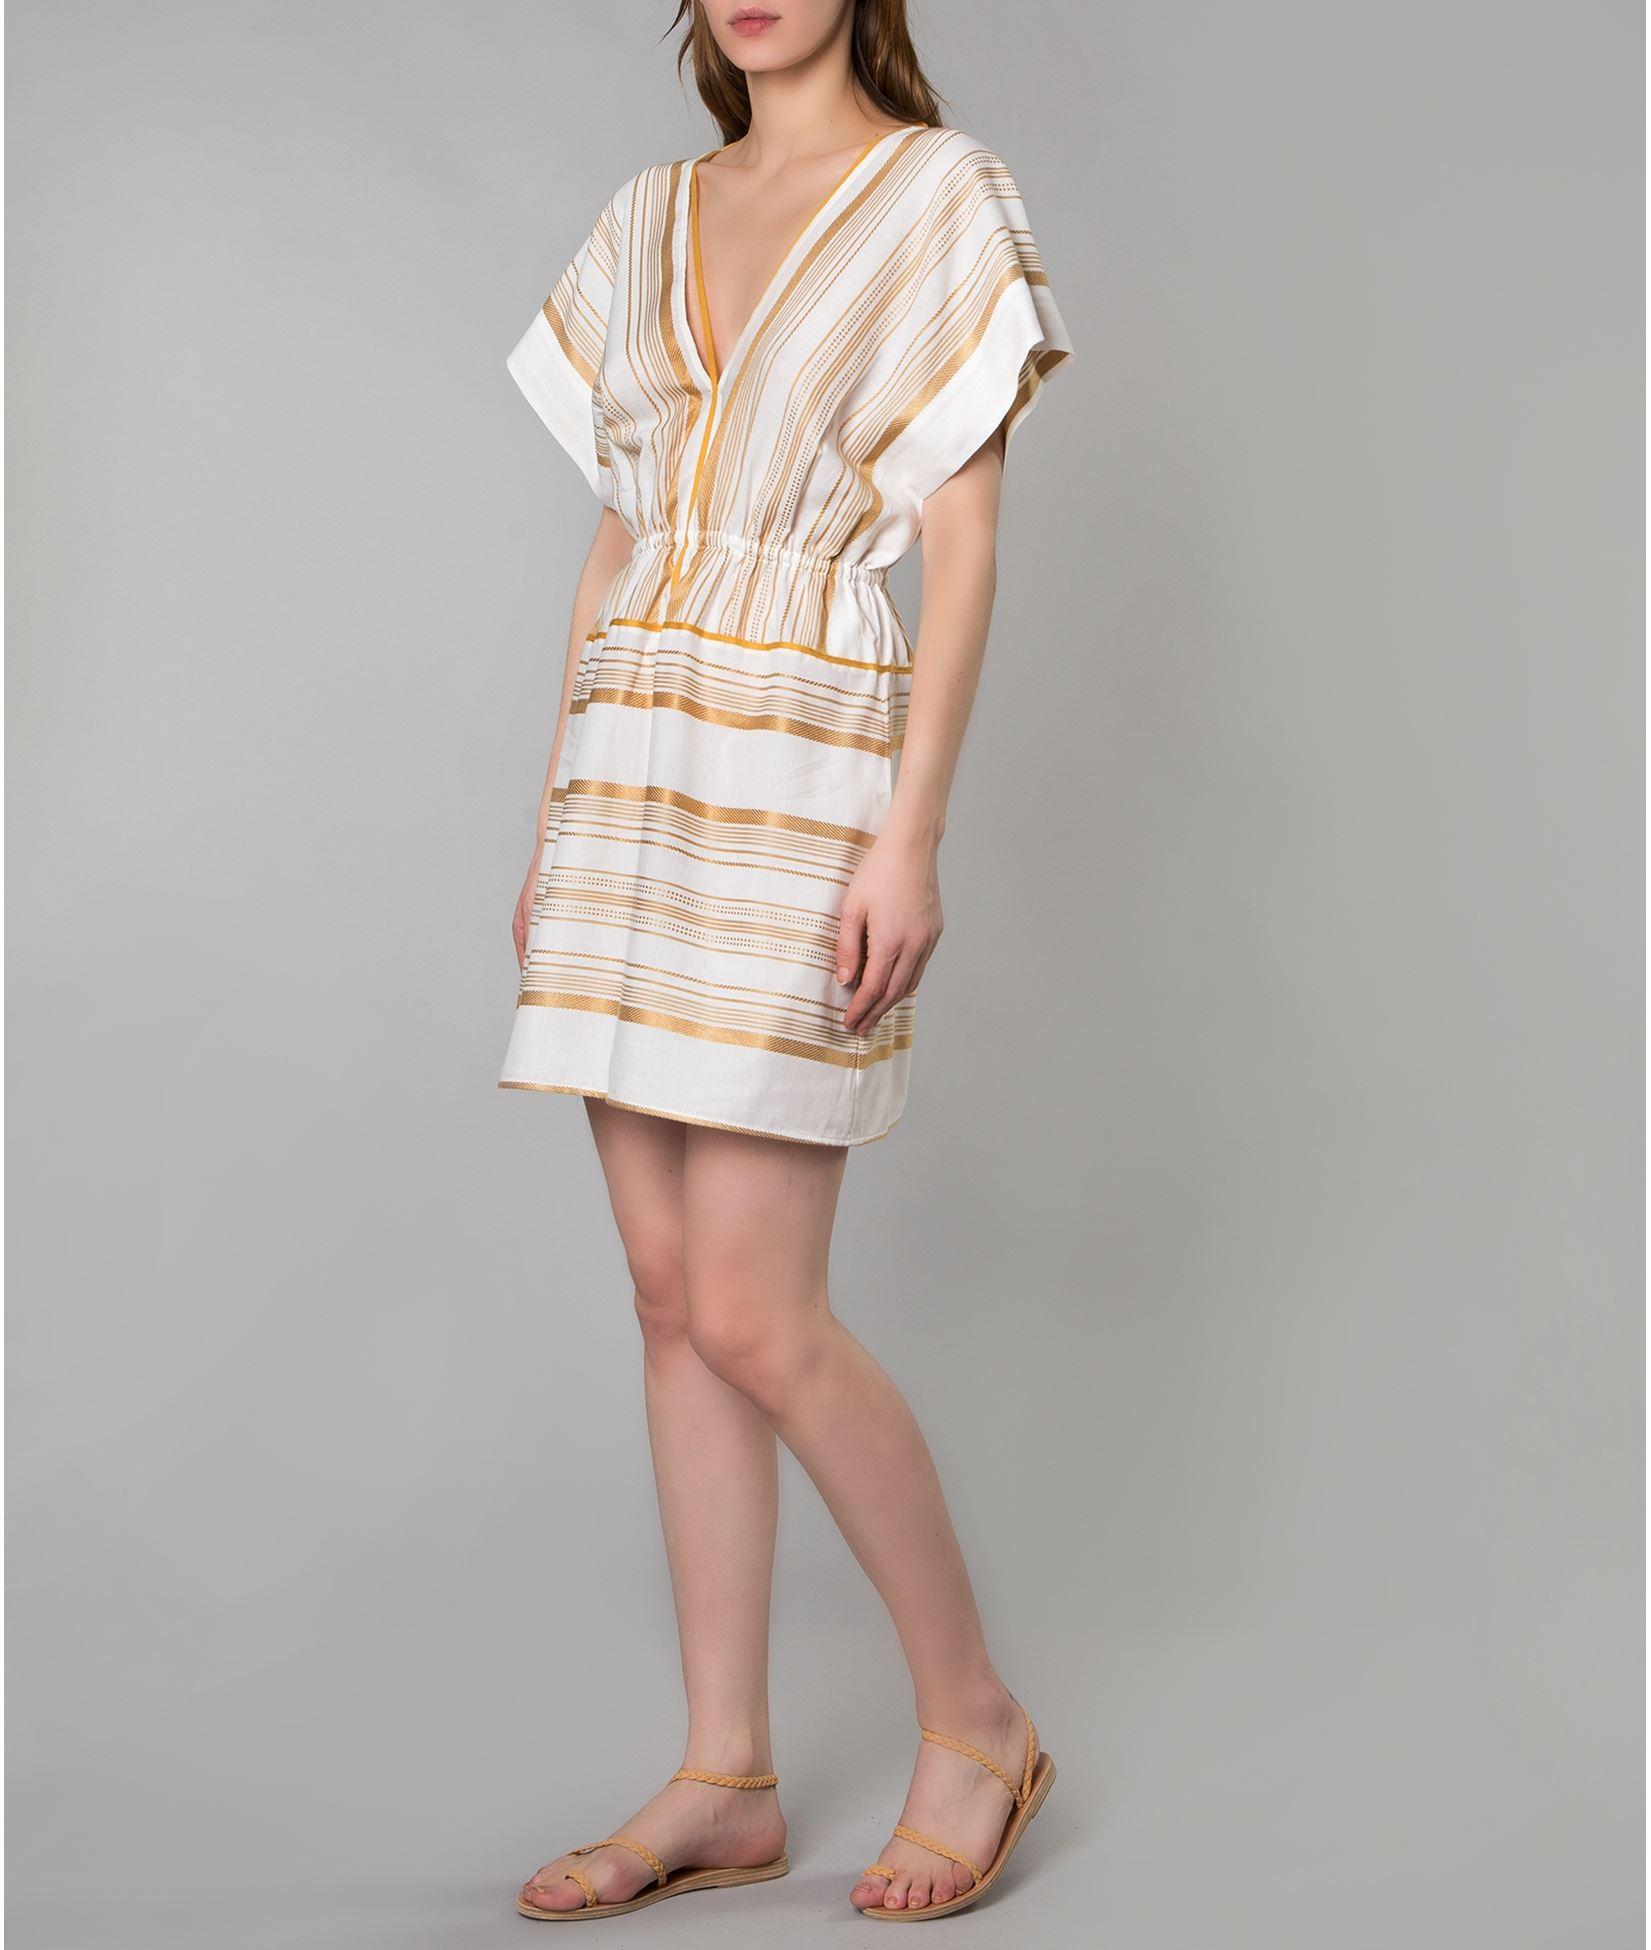 348495e8df14 Ioanna Kourbela Gold White Striped Mini Dress   ΦΟΡΕΜΑΤΑ ΠΑΡΑΛΙΑΣ ...